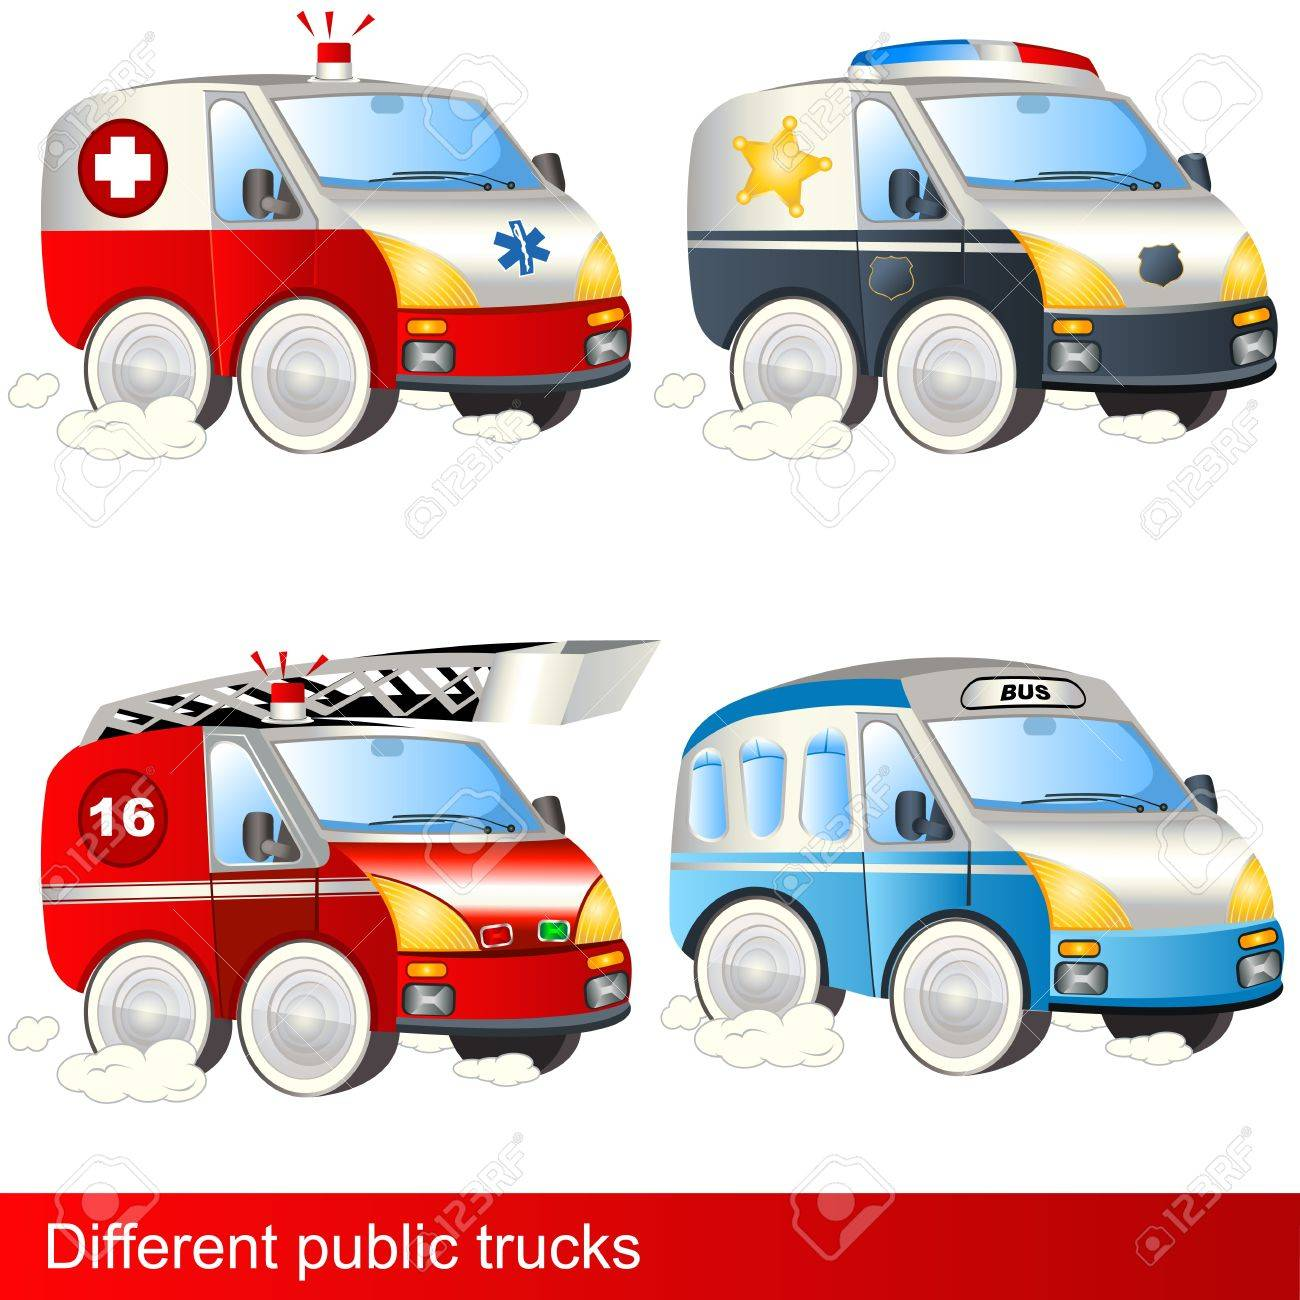 Four different public trucks ambulance police firetruck bus - 13651432